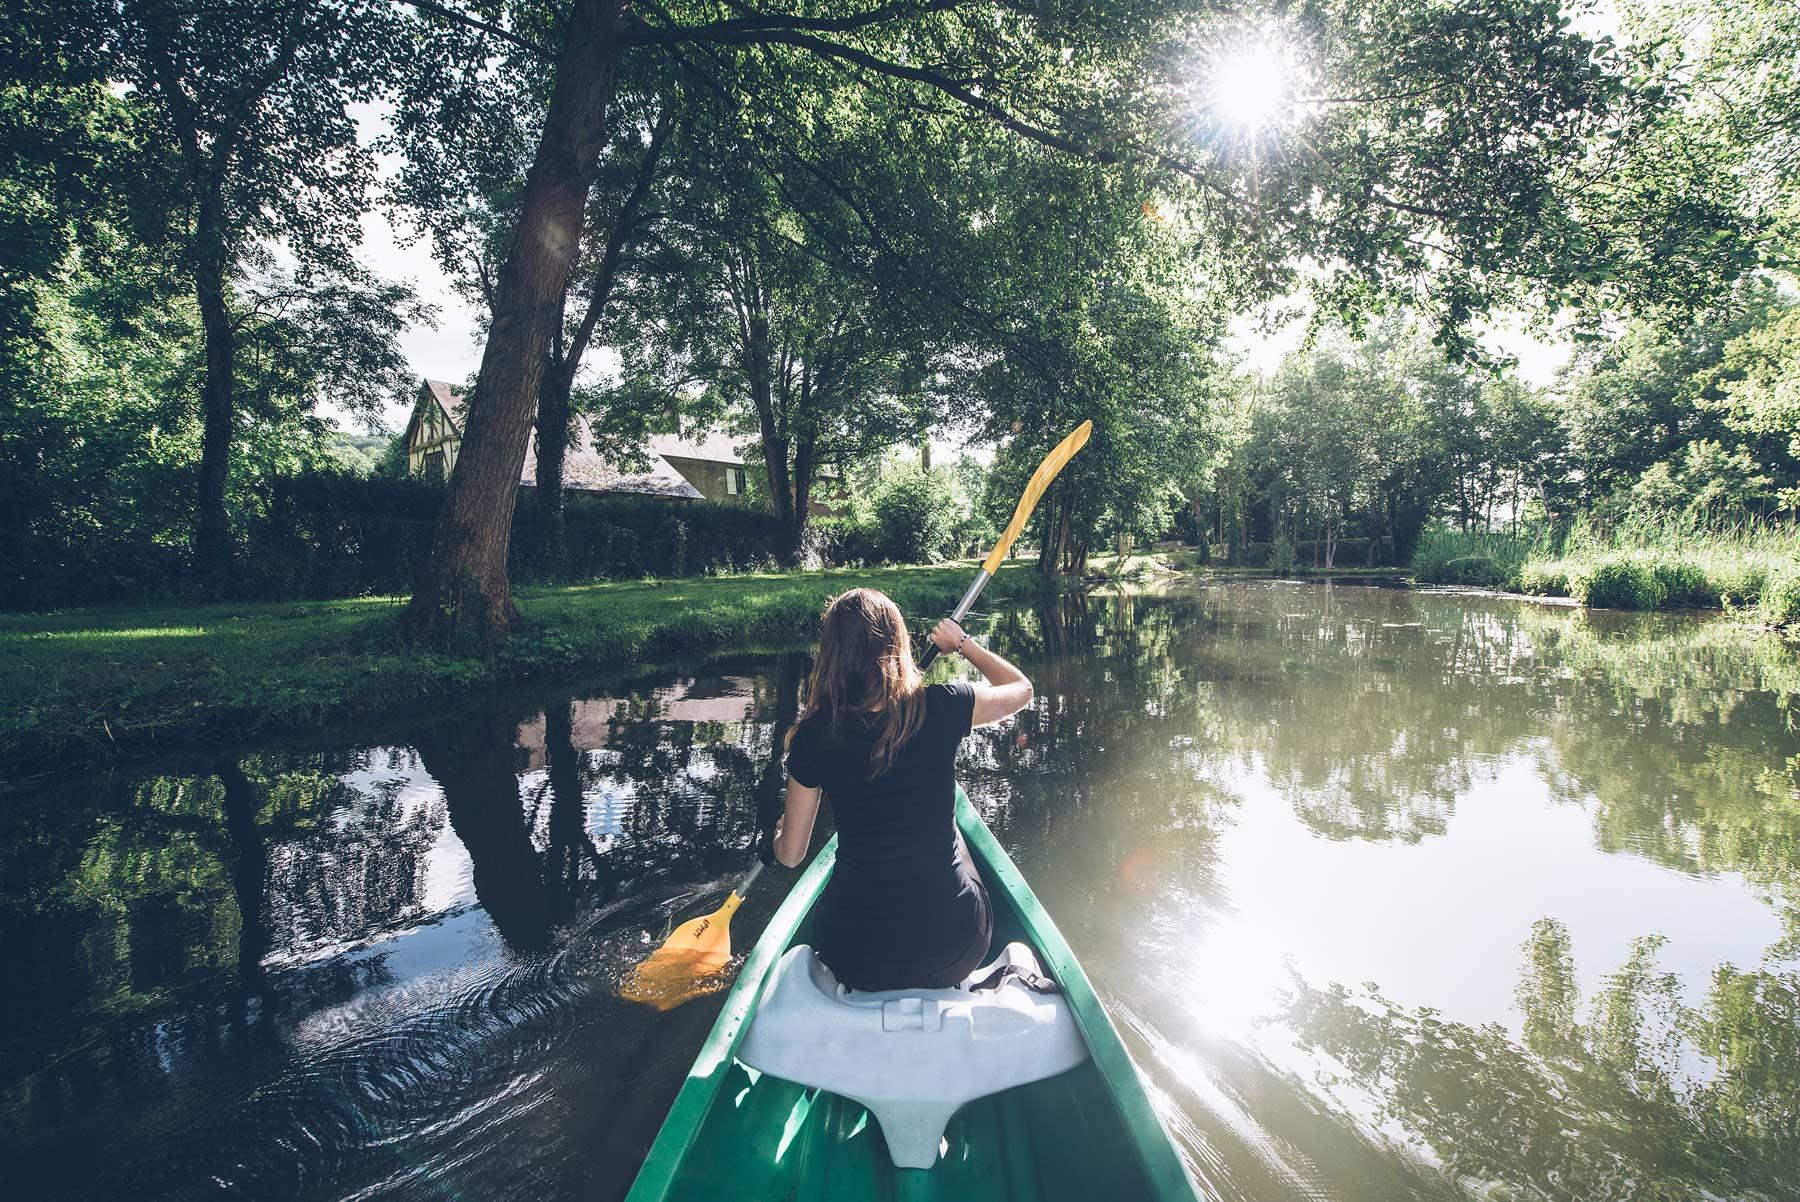 Canoe en Normandie, le Bonheur